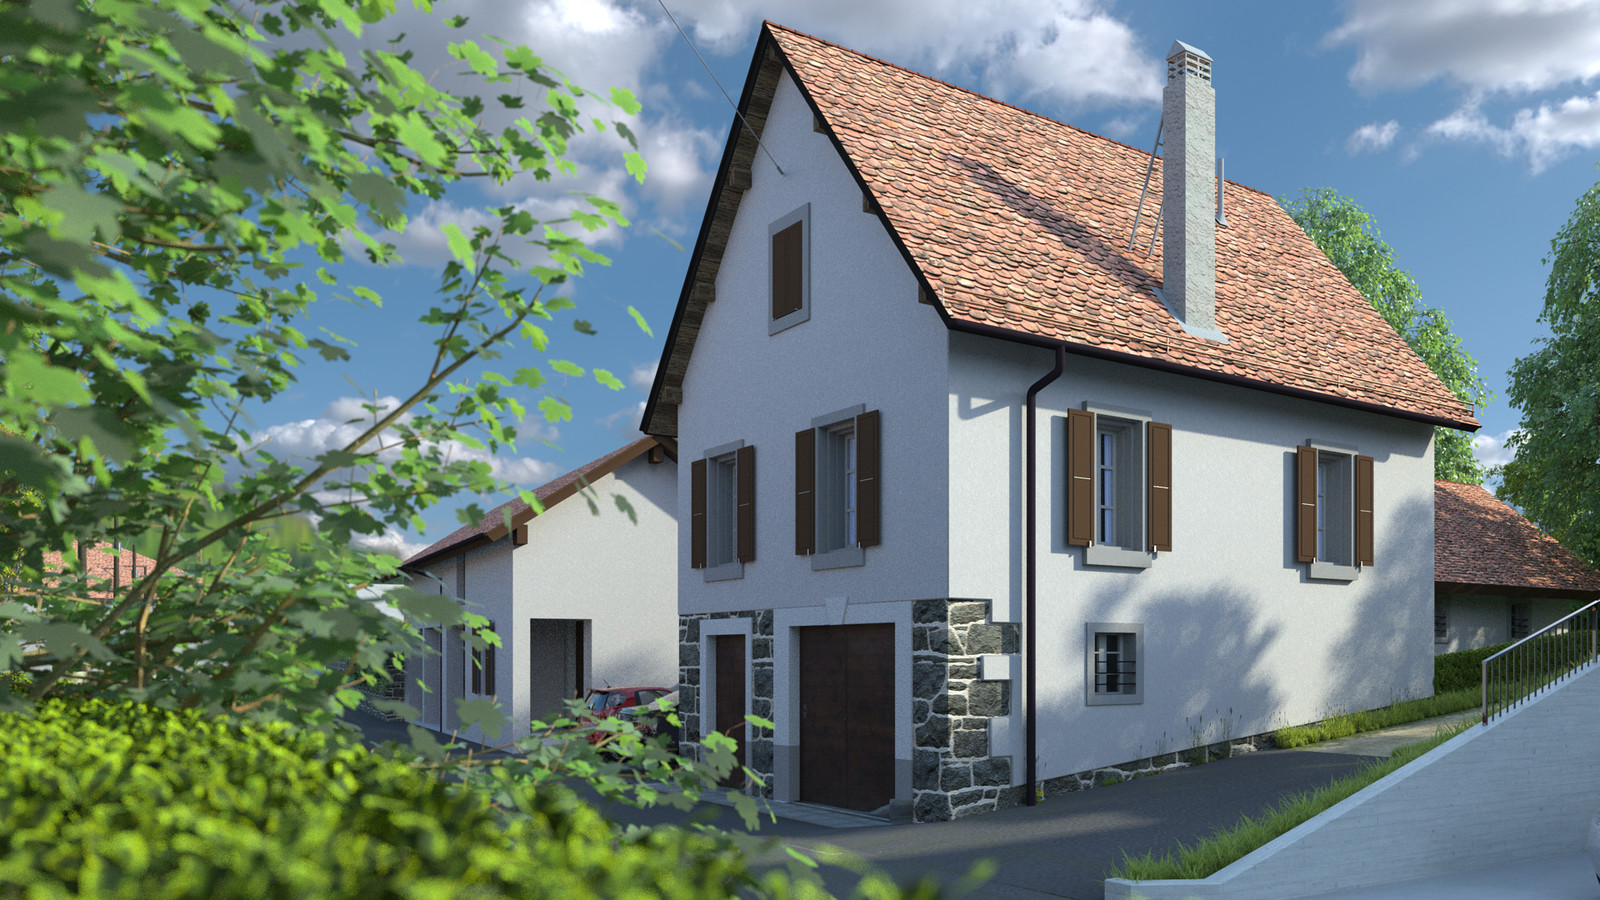 SketchUp + Thea Render  Little Swiss House Scene 28 162-hdri-skies 02 HD 1920 x 1080 Presto MC  HDR by HDRI-SKIES found here: http://hdri-skies.com/shop/hdri-sky-162/